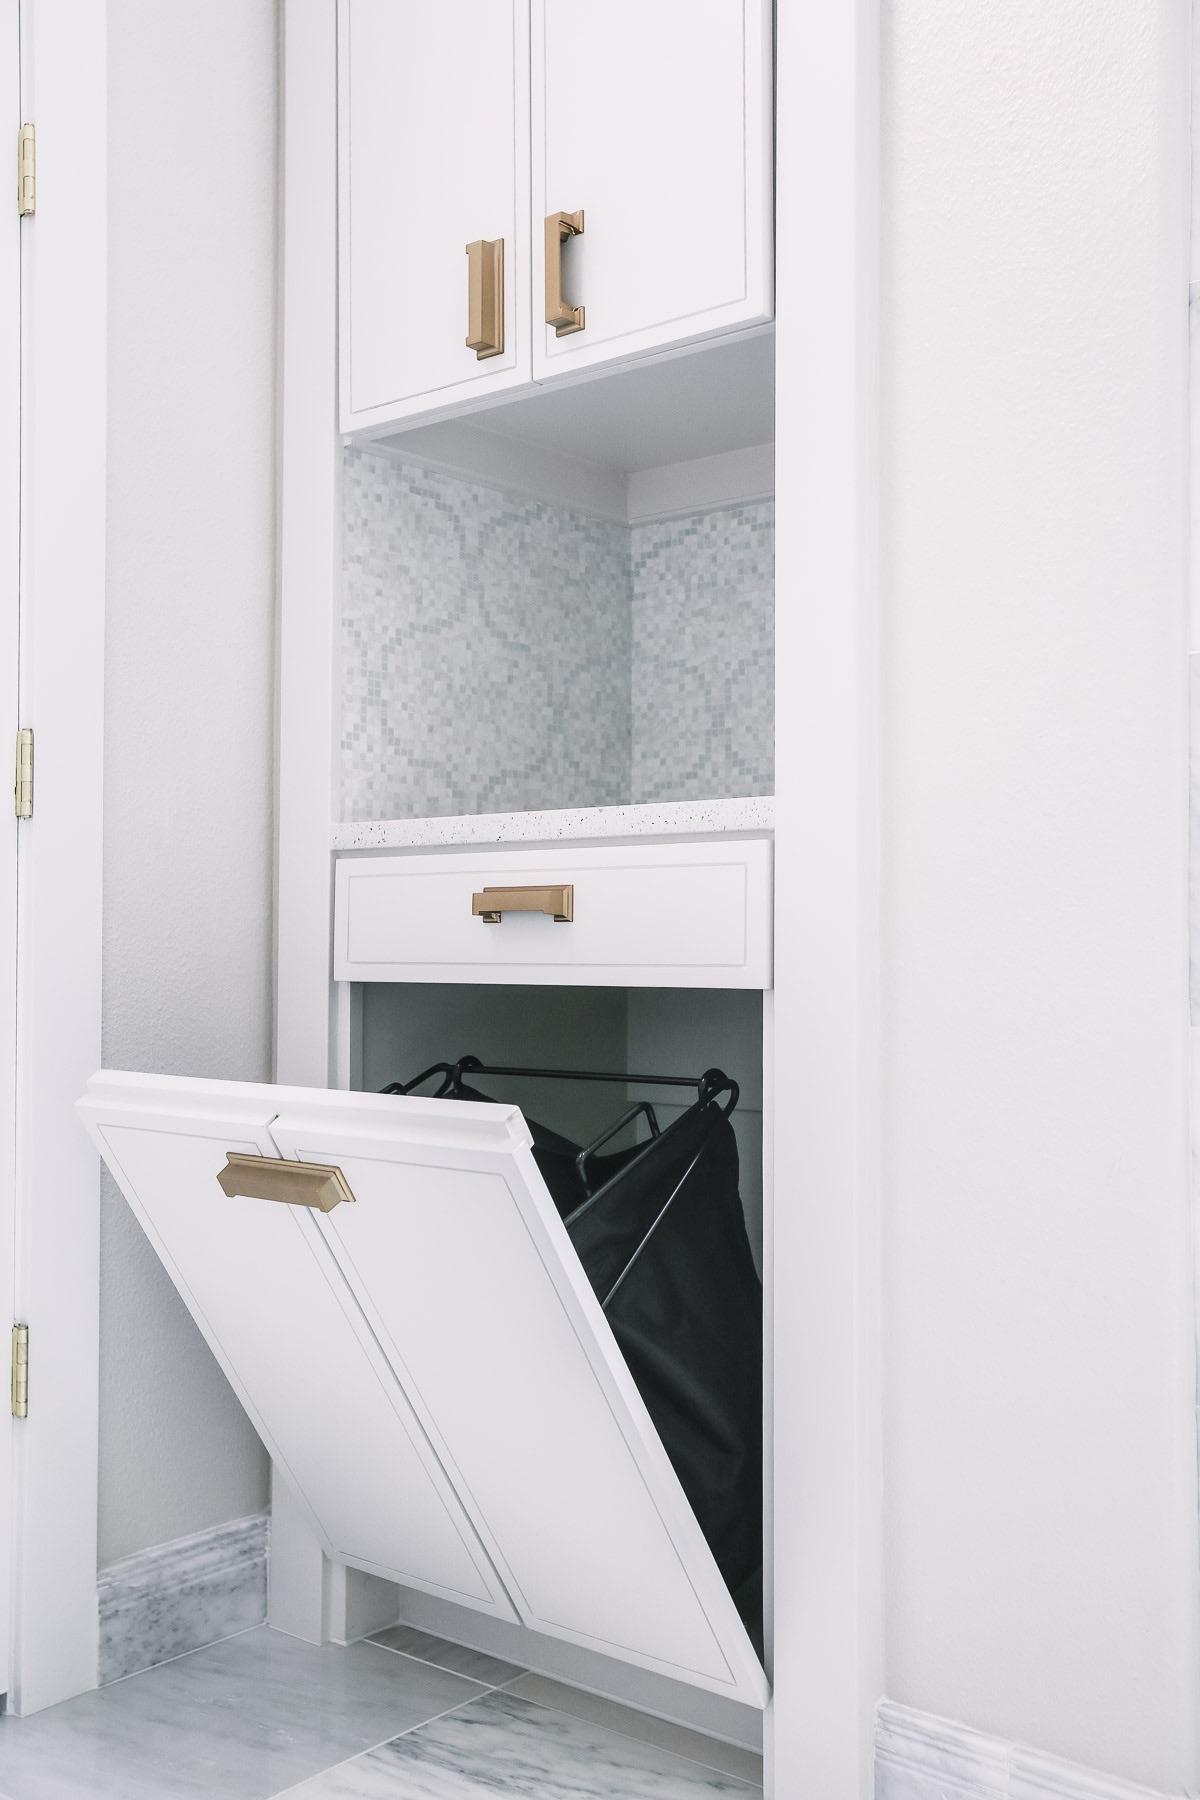 built-in-laundry-hamper.jpg